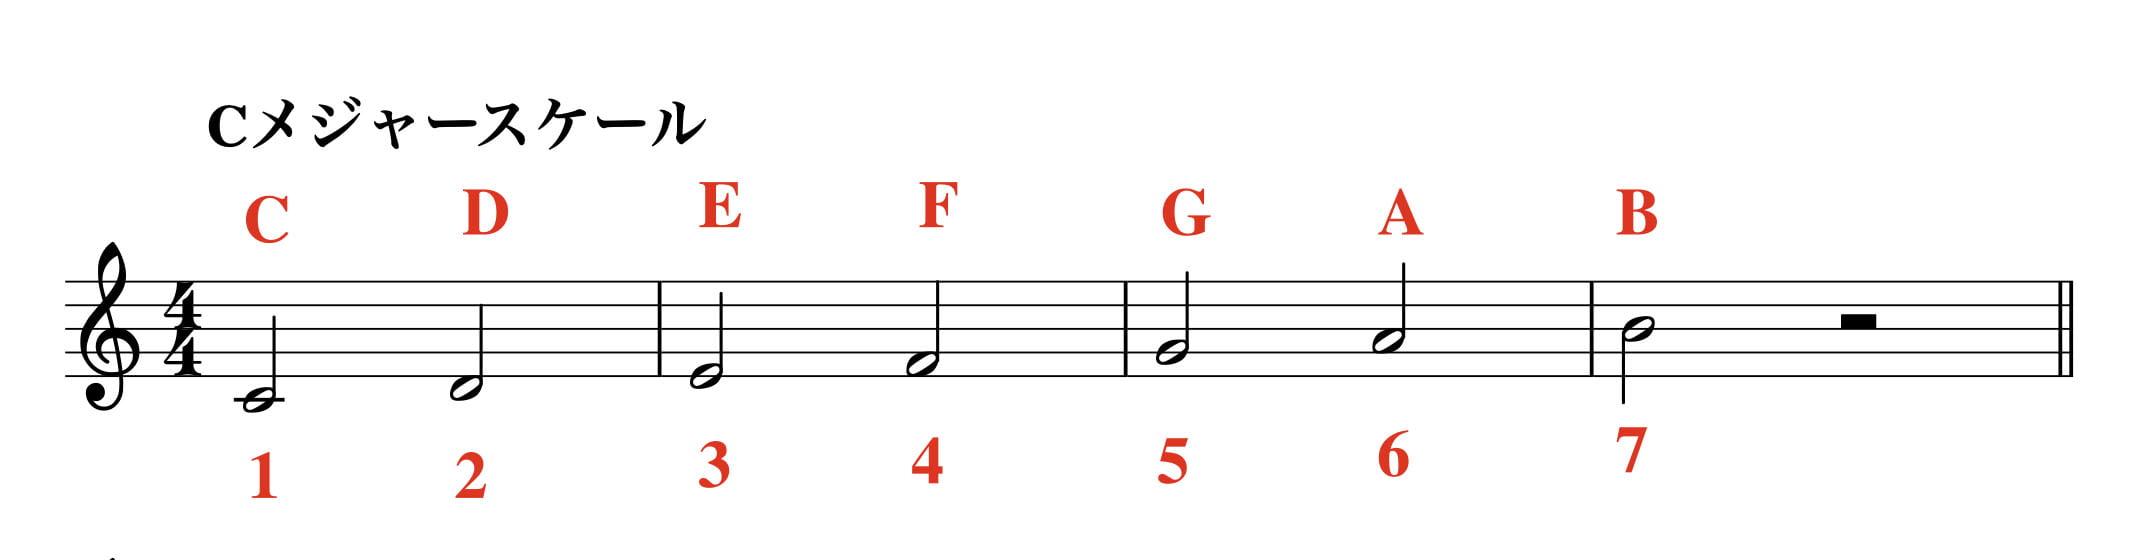 c-major-scale